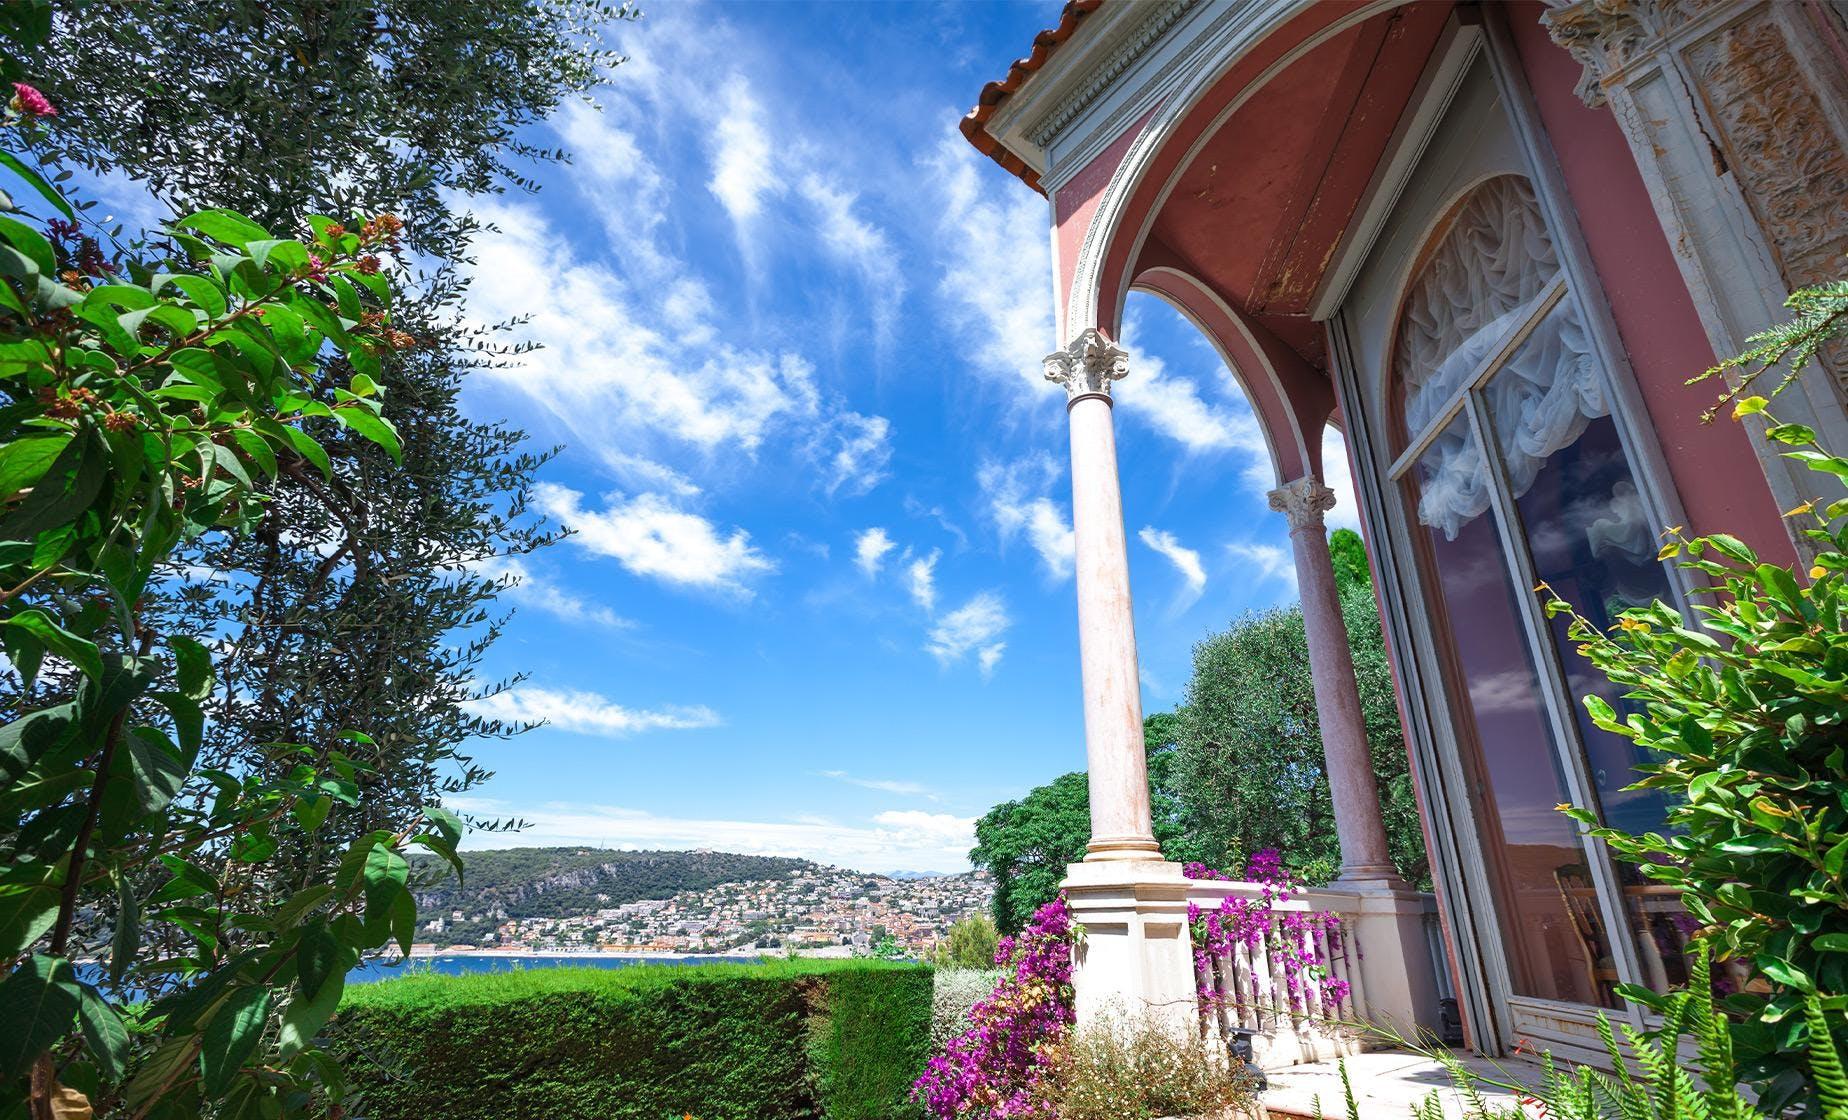 Private Rothschild Foundation and Villa Kérylos